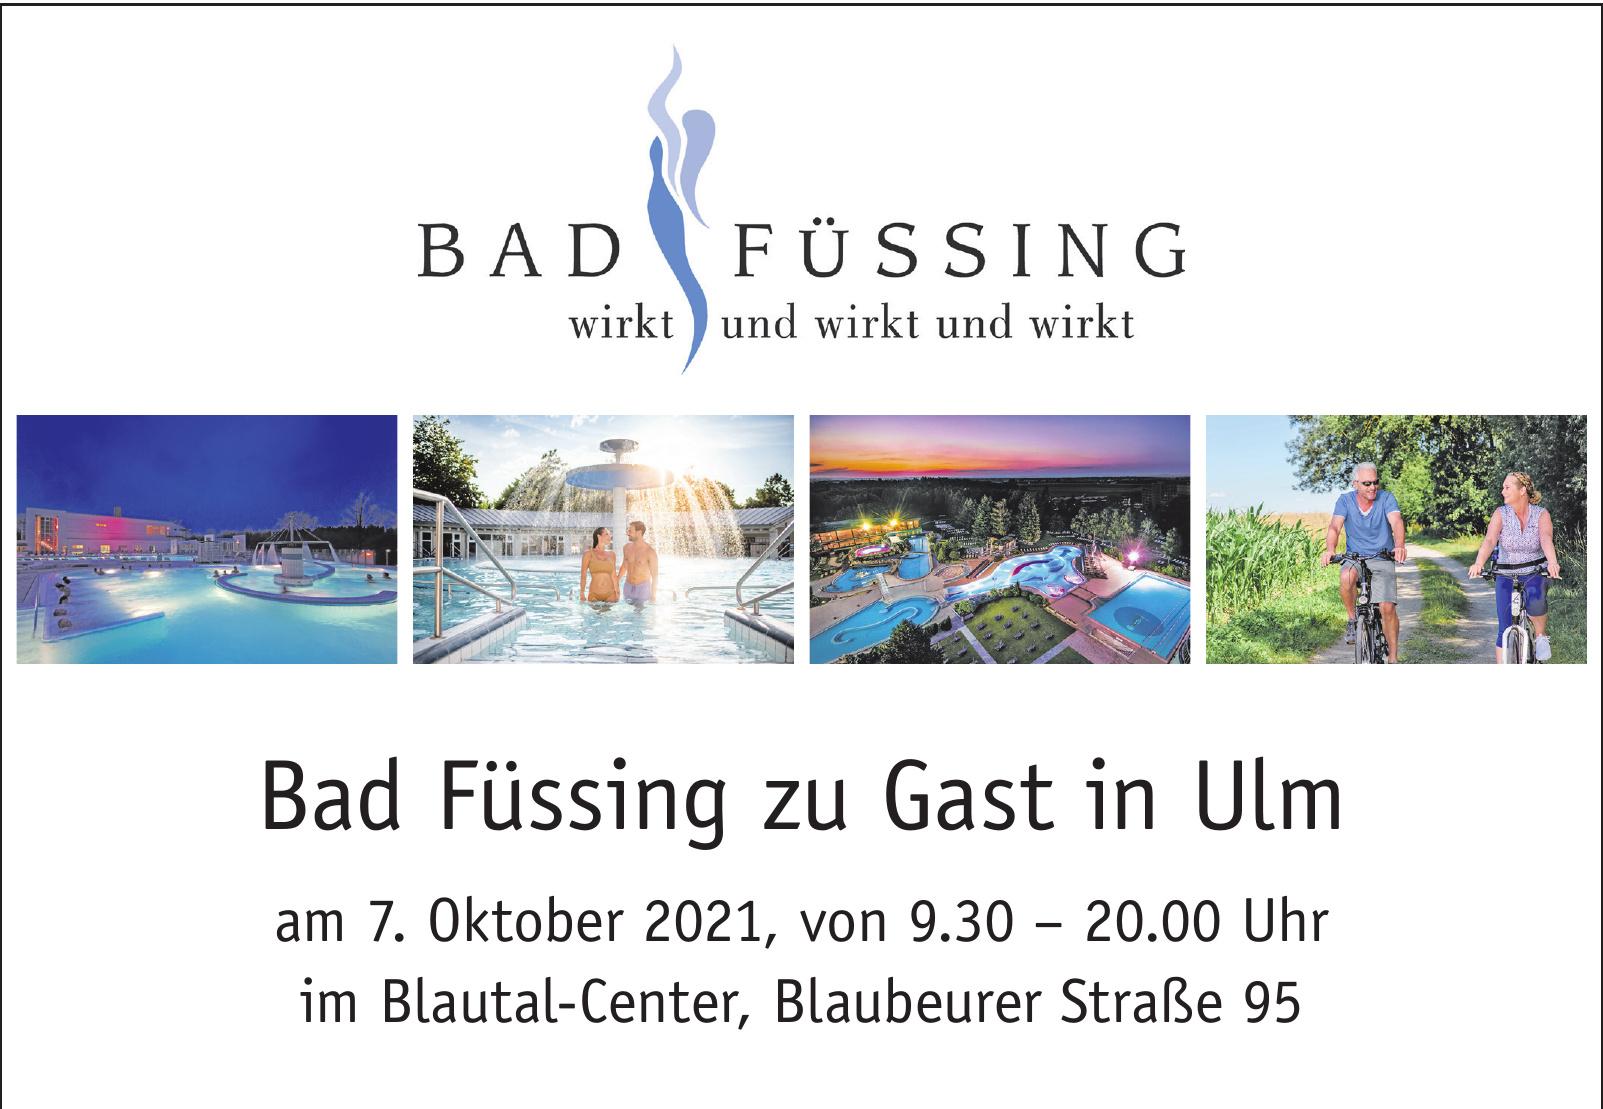 Bad Füssing